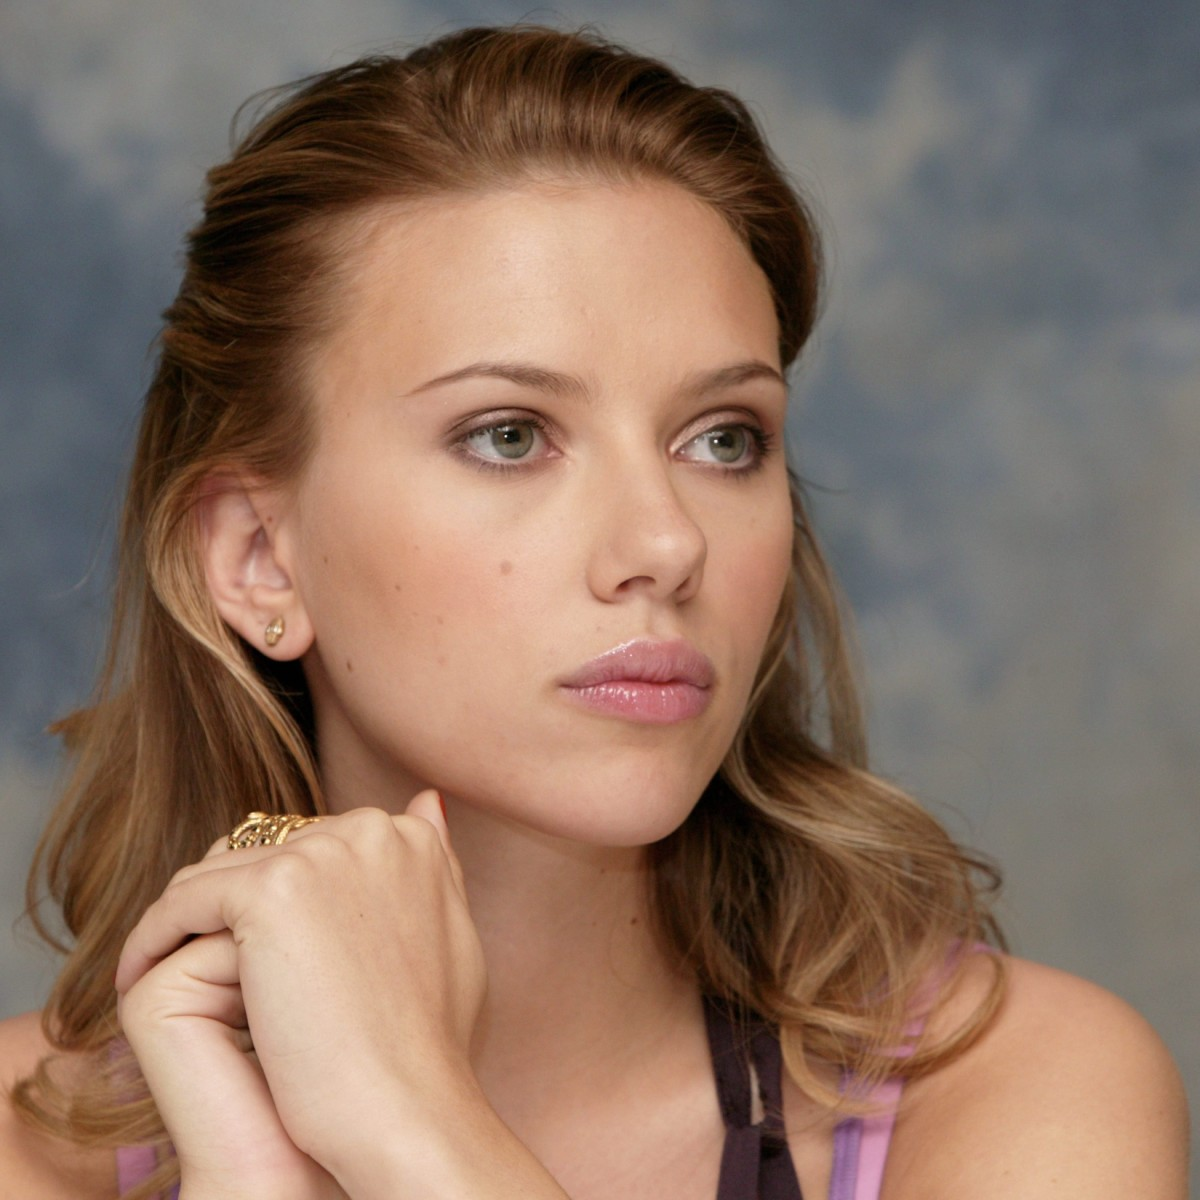 Scarlett Johansson Without Makeup